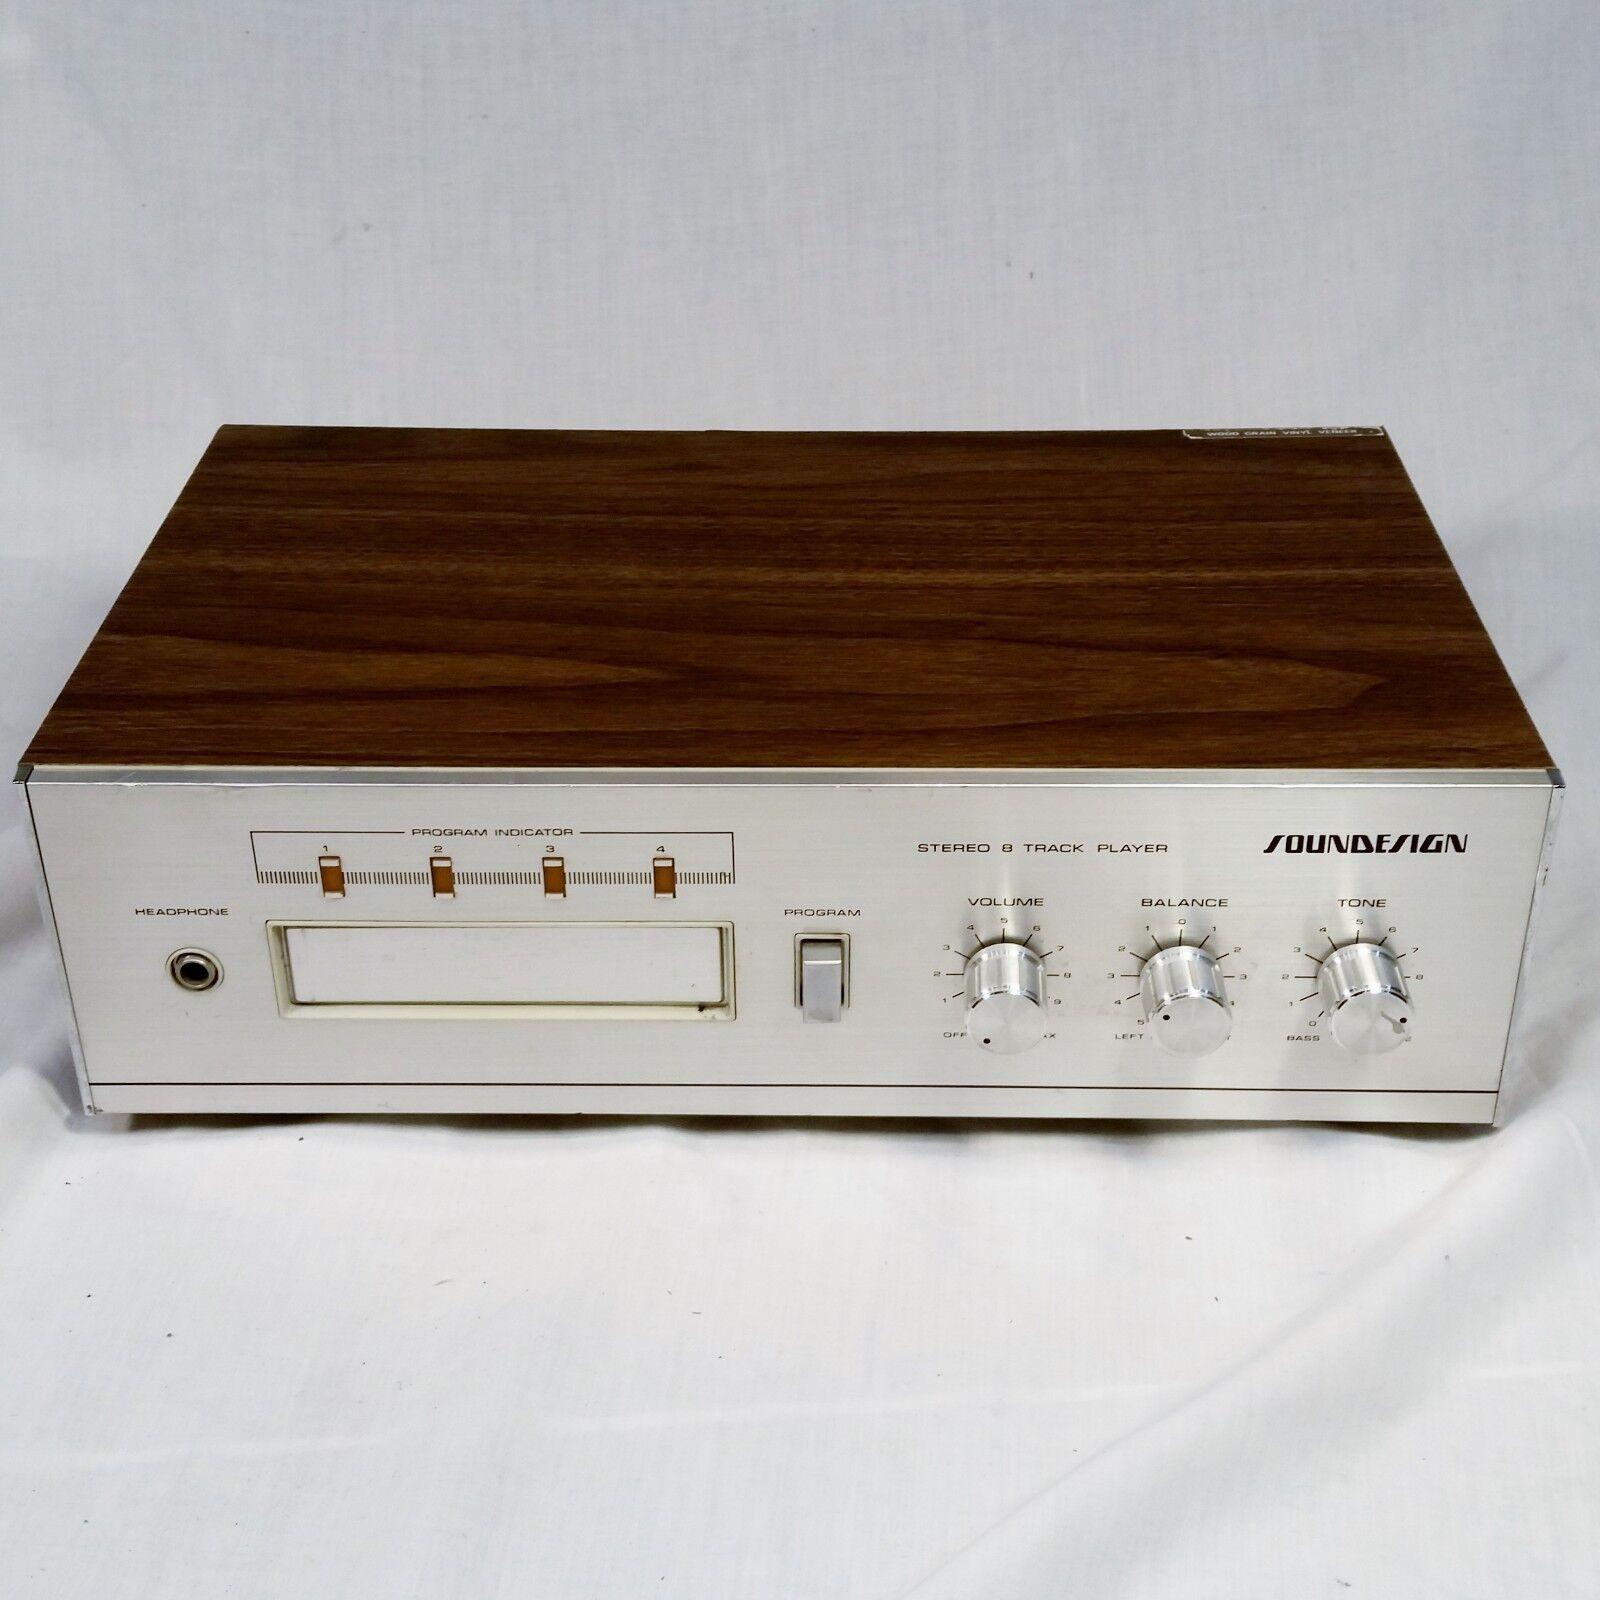 Vtg Soundesign 5018 8 Track Player Stereo Alleinstehend Interner Verstärker